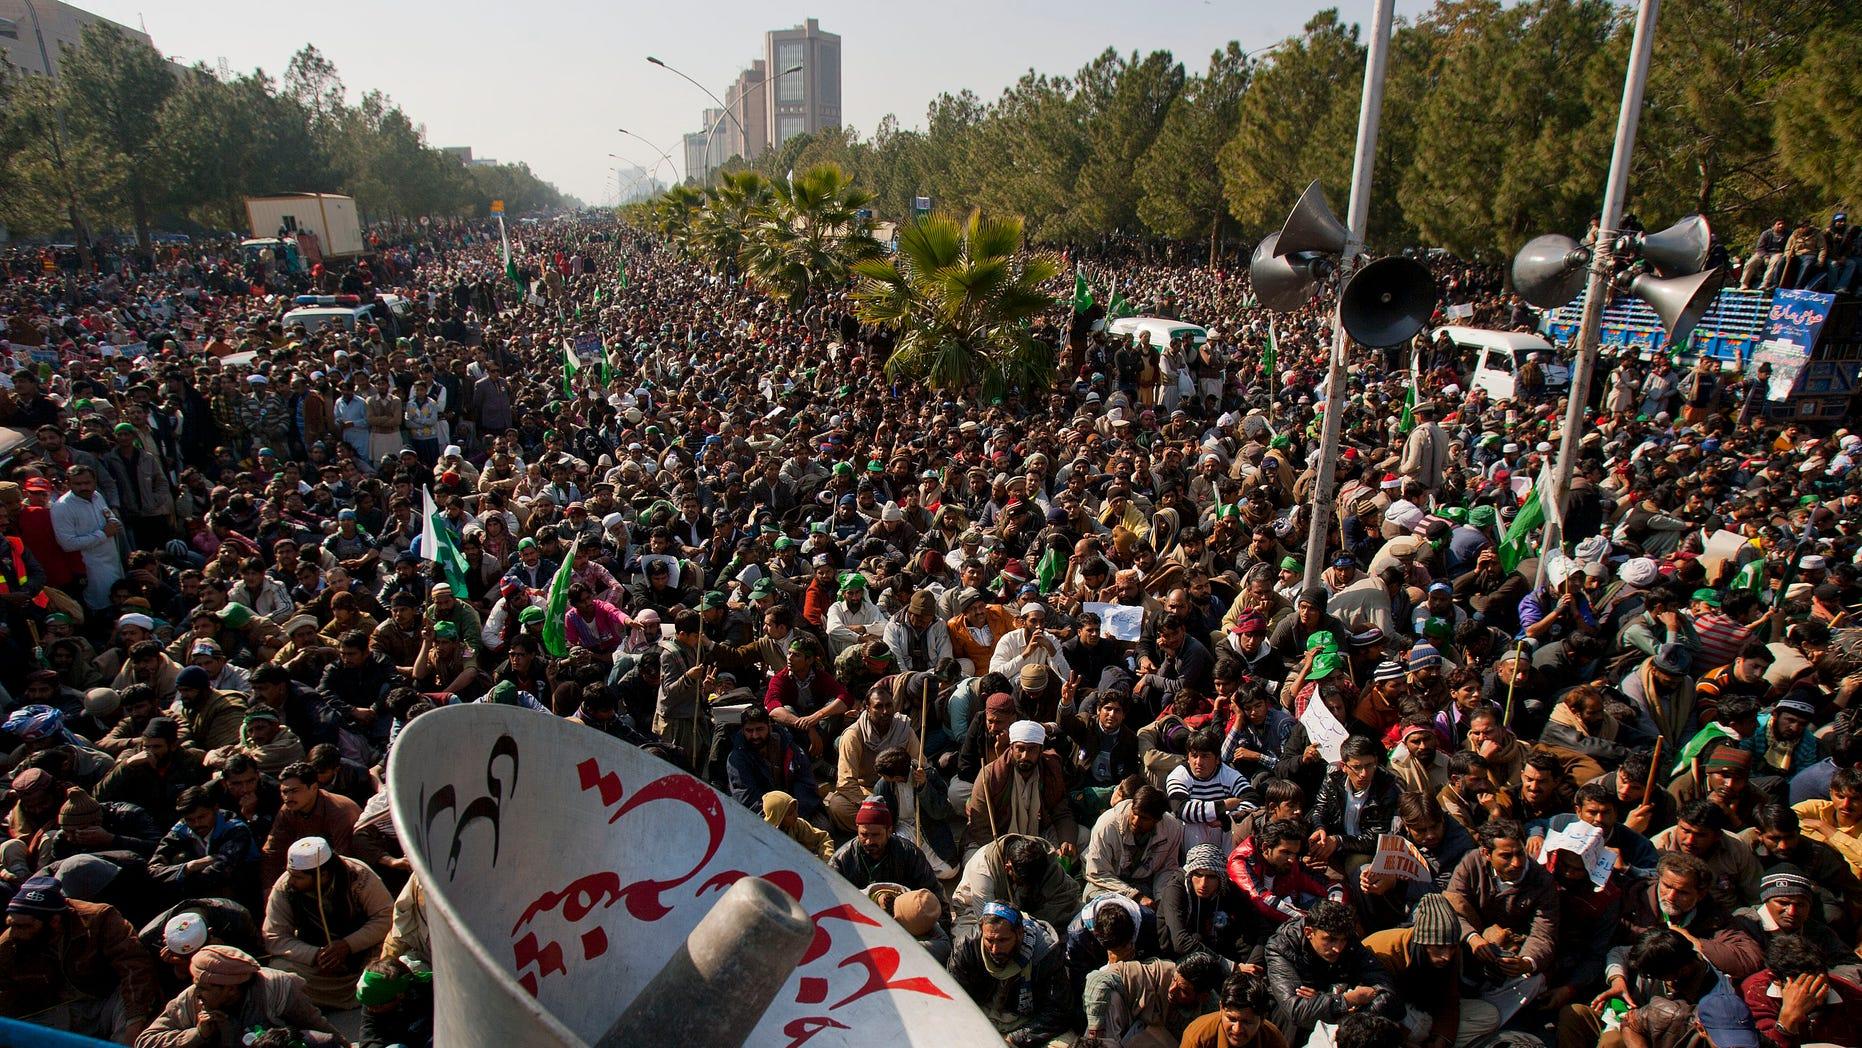 Jan. 15, 2013: Supporters of Pakistani Sunni Muslim cleric Tahir-ul-Qadri listen to a speech by ul-Qadri, unshown, at an anti-government rally in Islamabad, Pakistan.